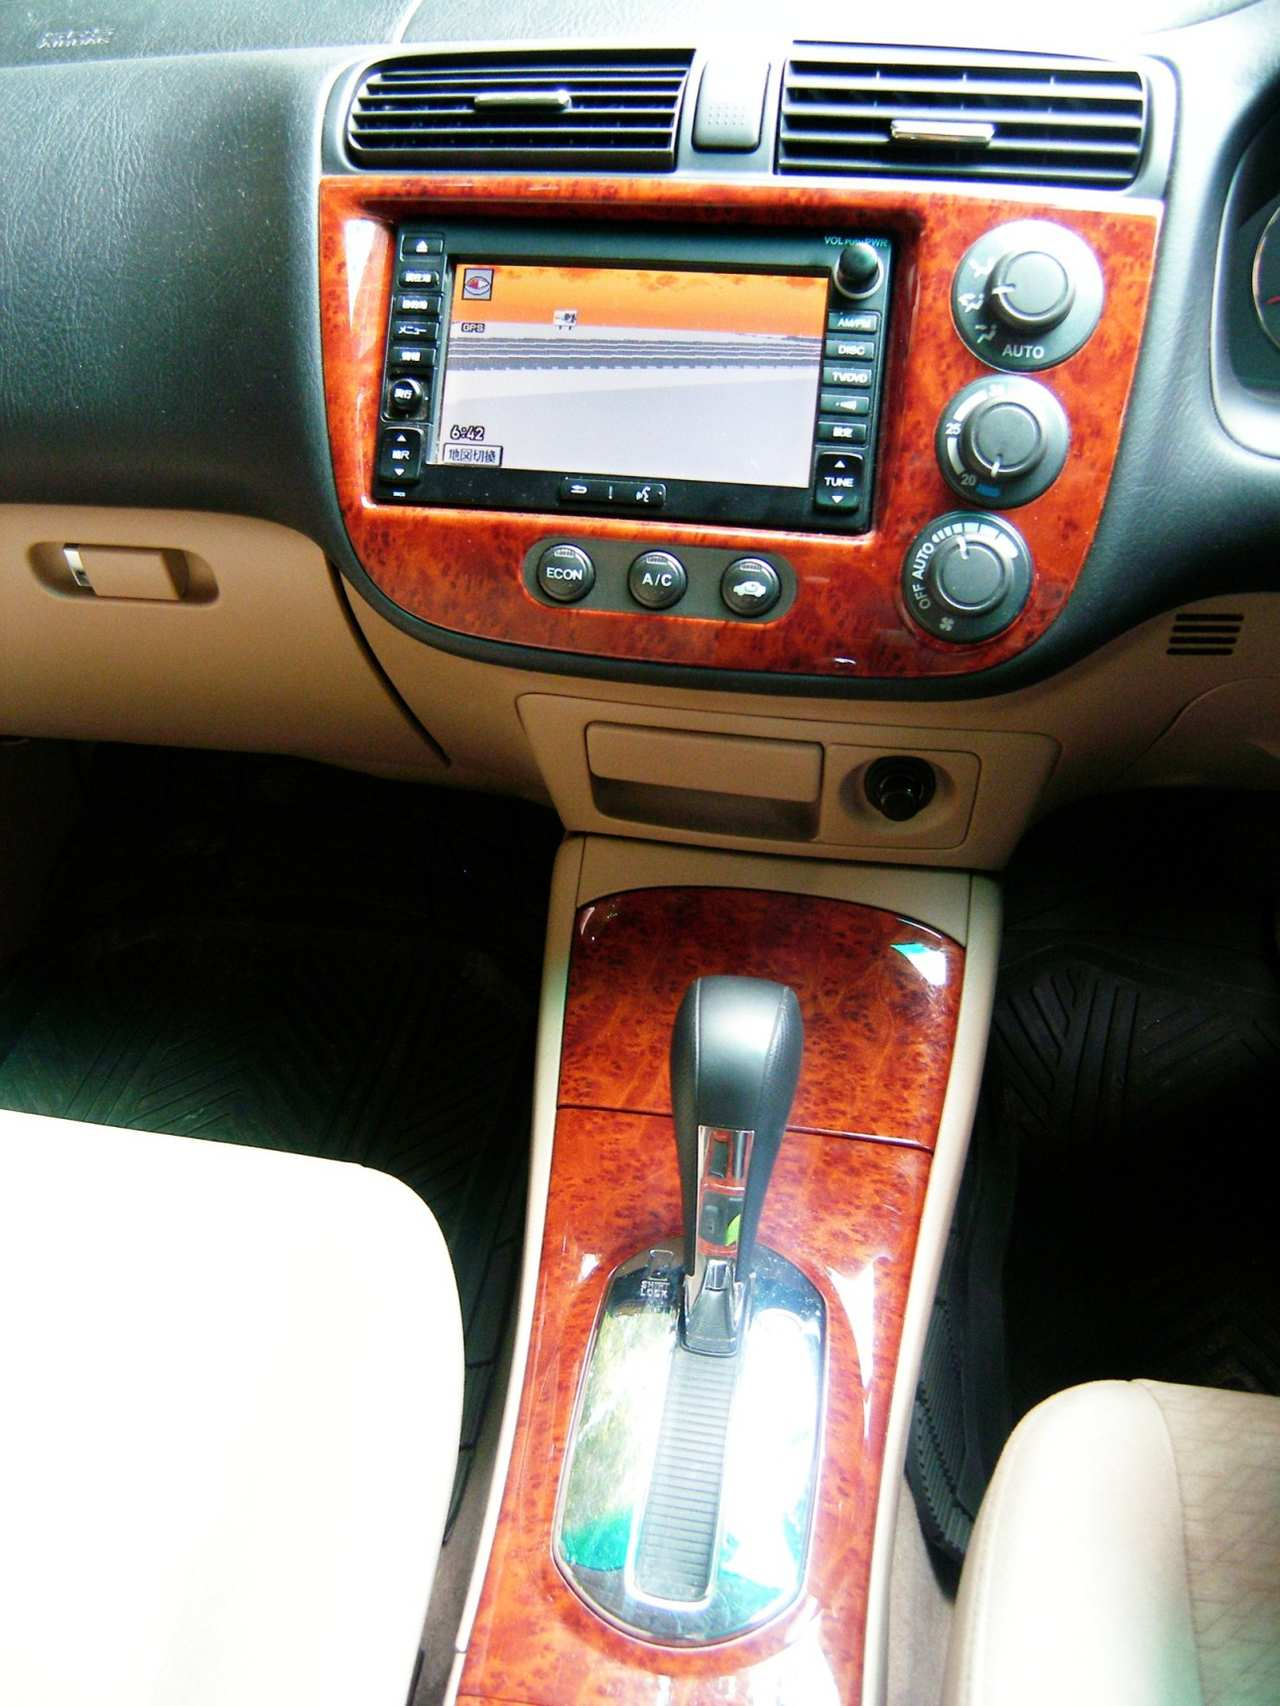 Honda Insight Cvt Transmission Problems Html Auto Electrical Manual Clutch Diagram Insightcentralnet Encyclopedia